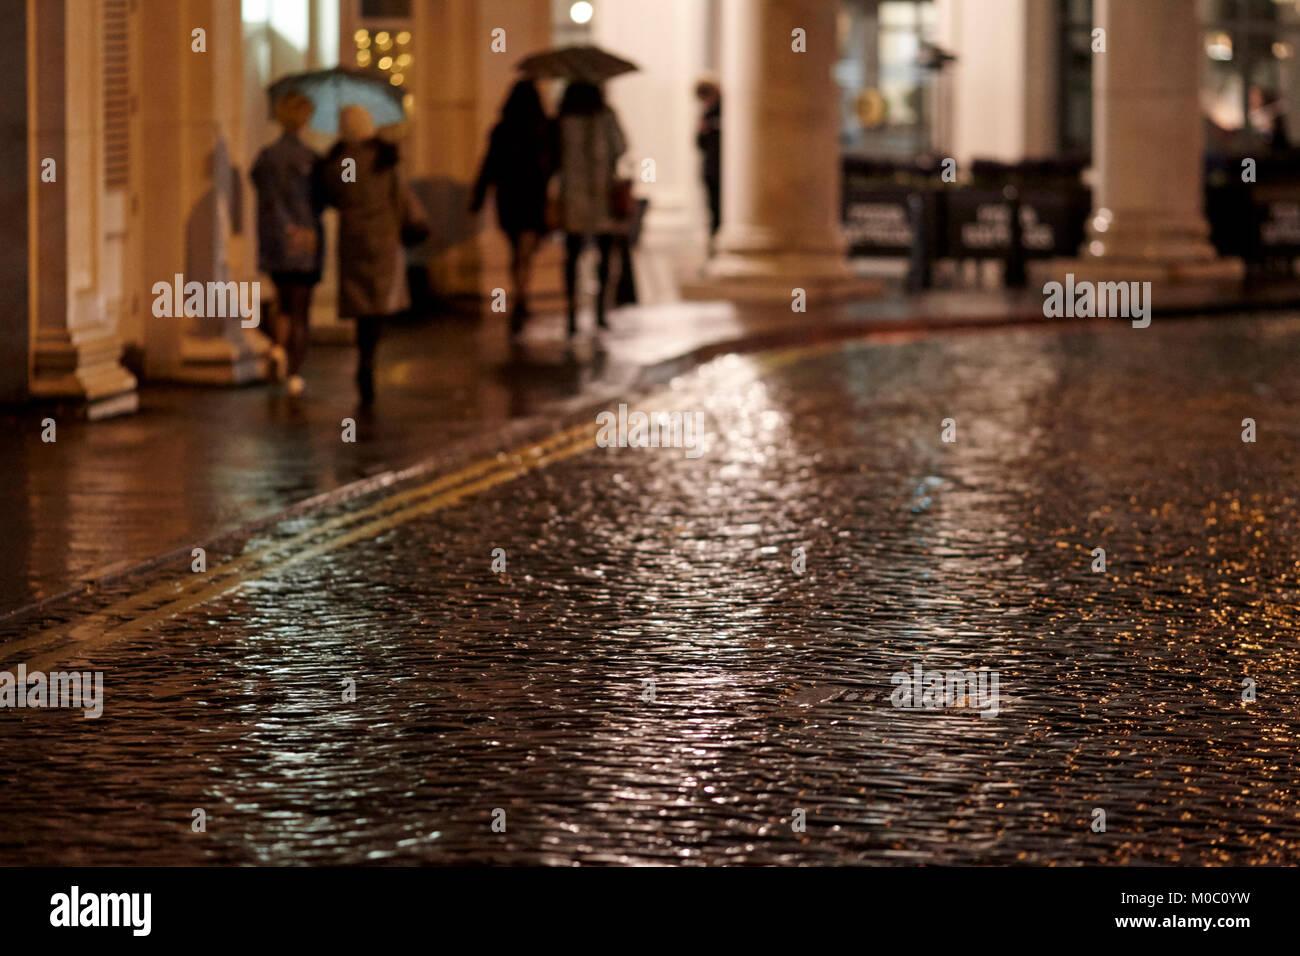 women walking at night on path near wet cobblestoned street at night belfast northern ireland uk - Stock Image